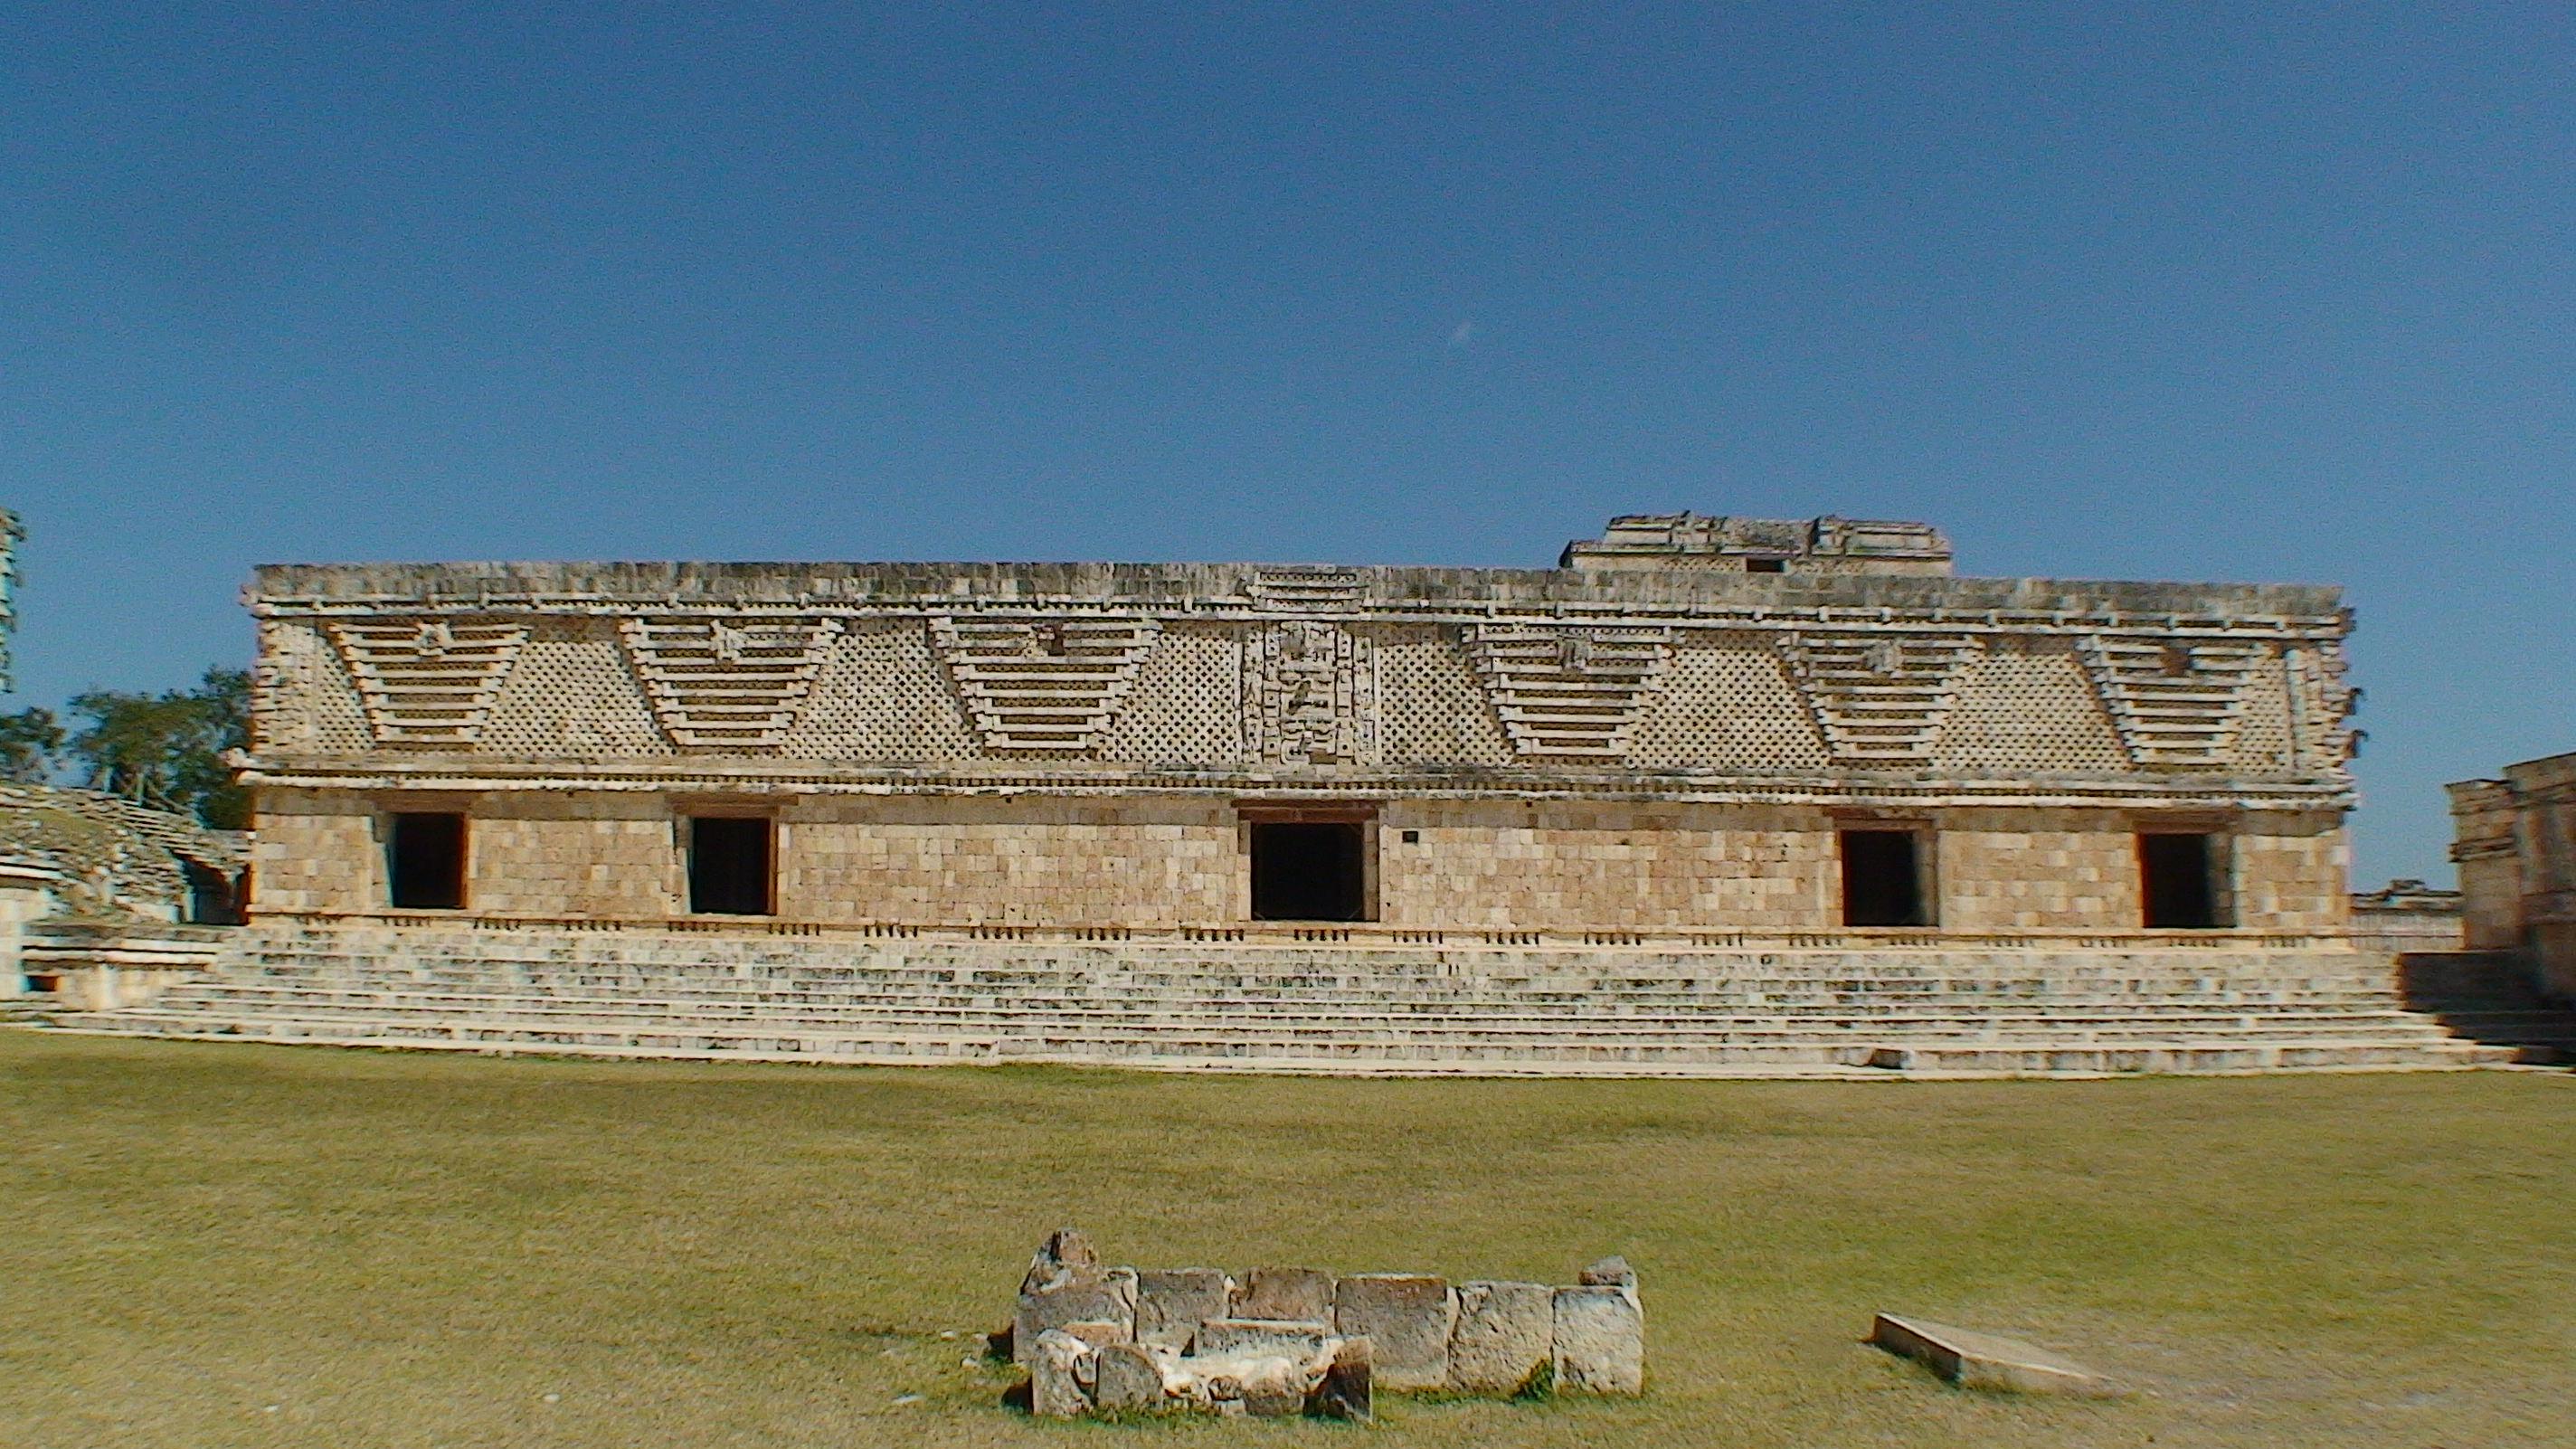 maya architecture - ancient history encyclopedia